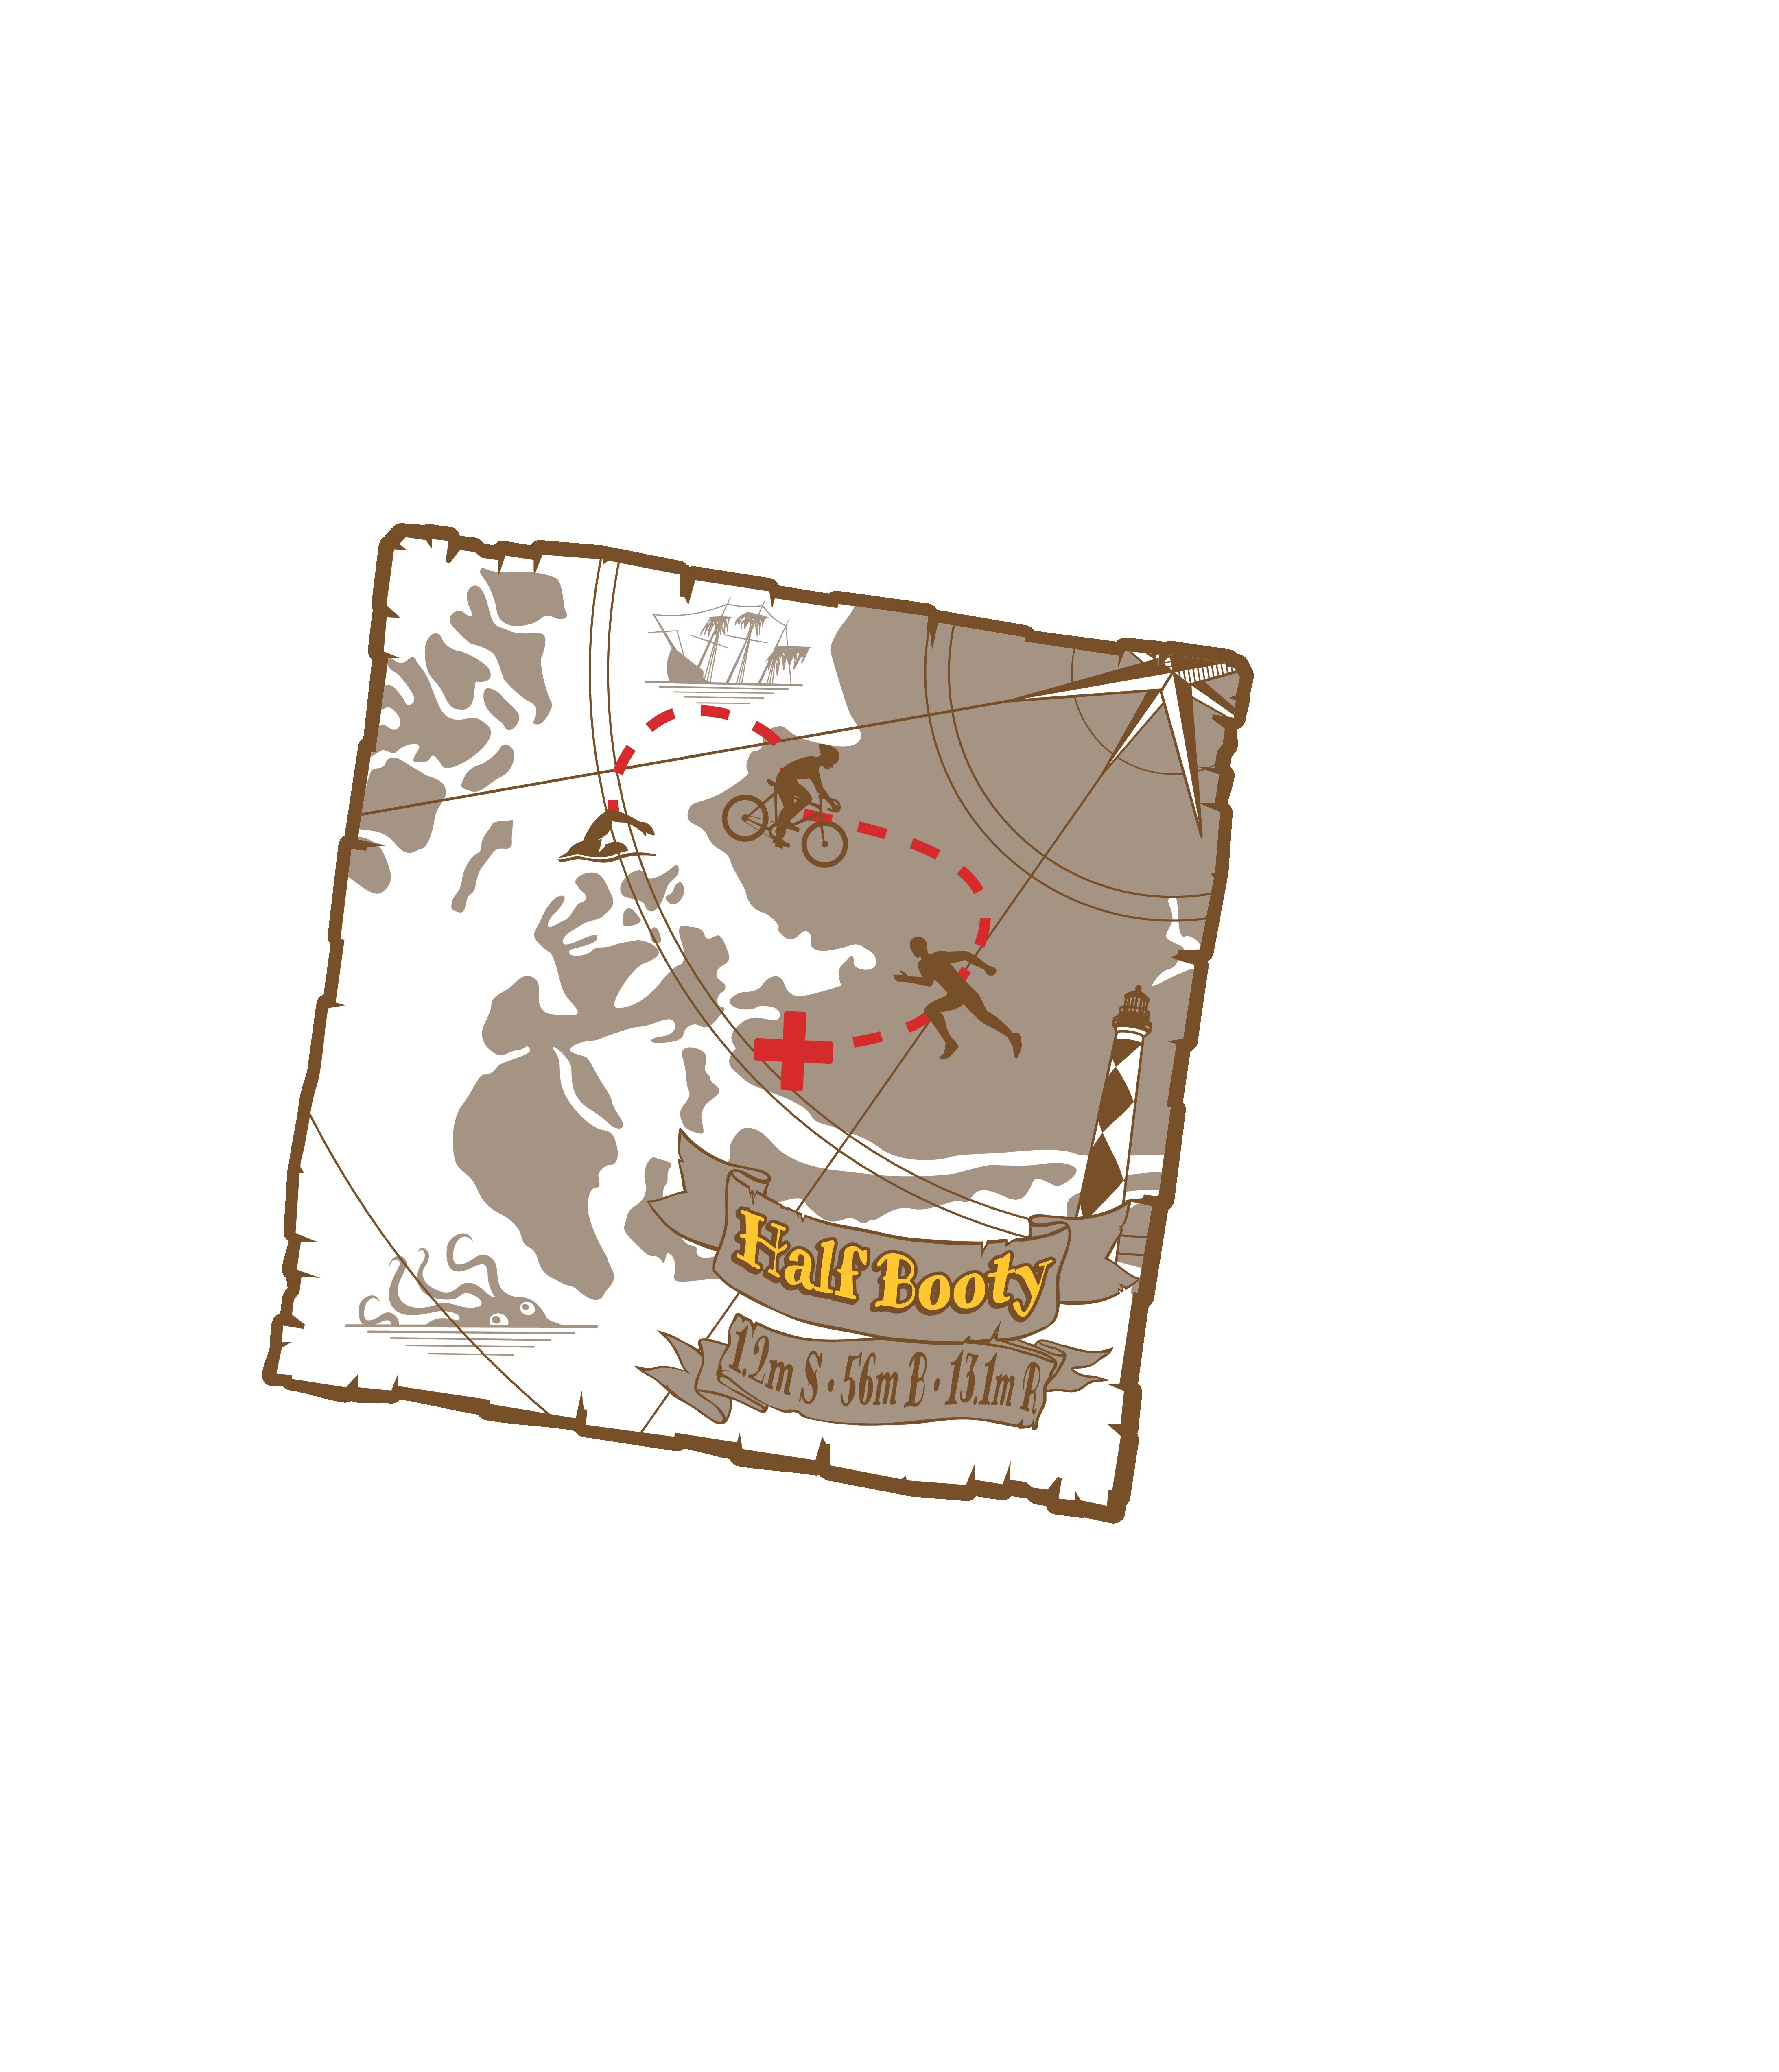 Crystal Coast Half Booty Triathlon